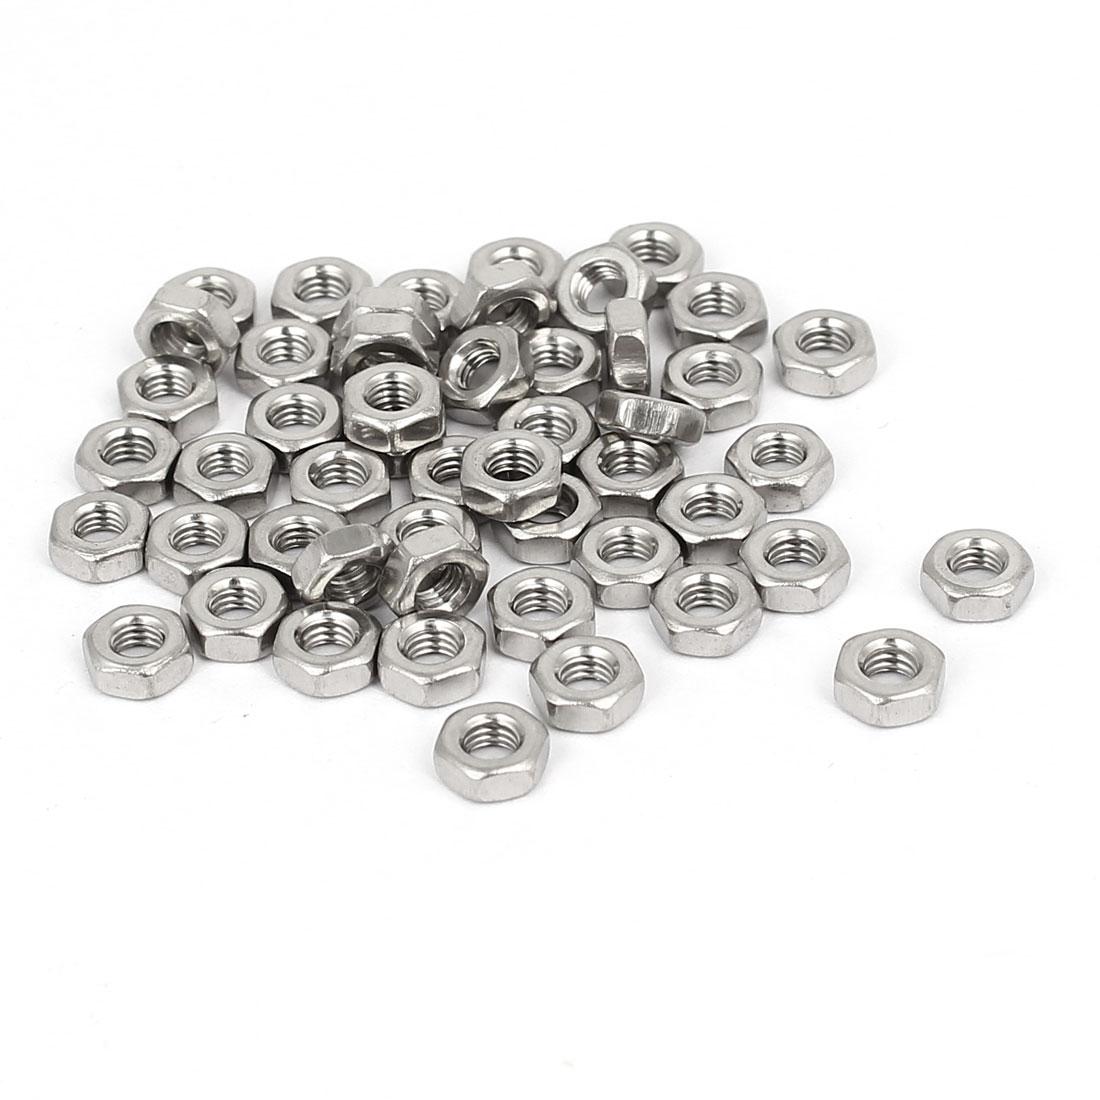 M3 x 2mm 304 Stainless Steel Machine Screw Hex Hexagon Nuts Fastener 50pcs